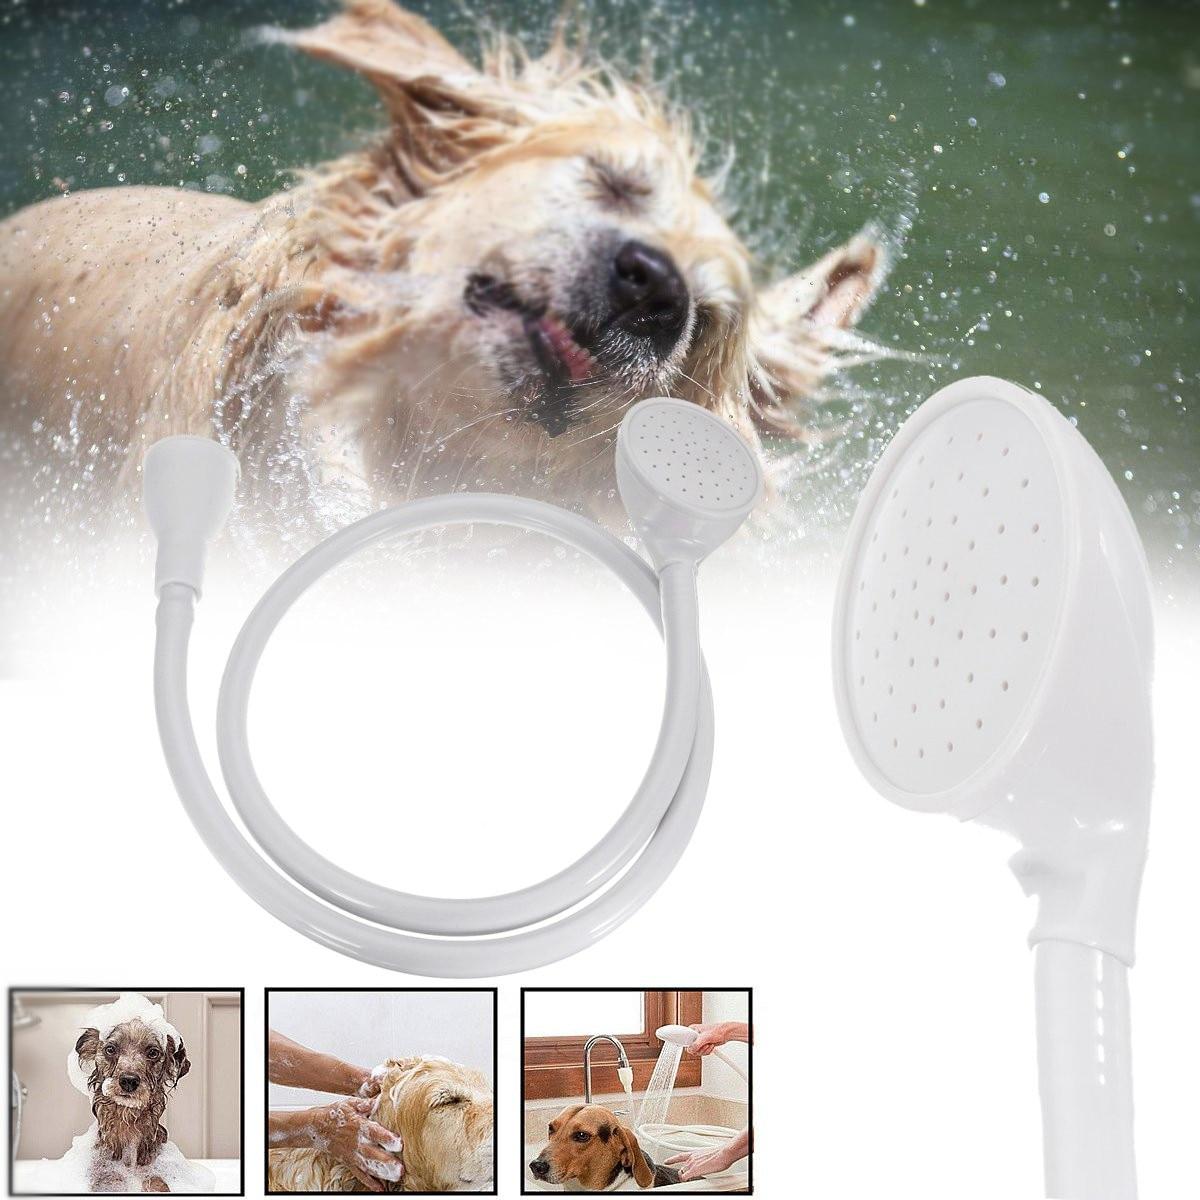 White Tap Shower Spray Hose Bath Tub Sink Spray Attachment Head Pet Washing